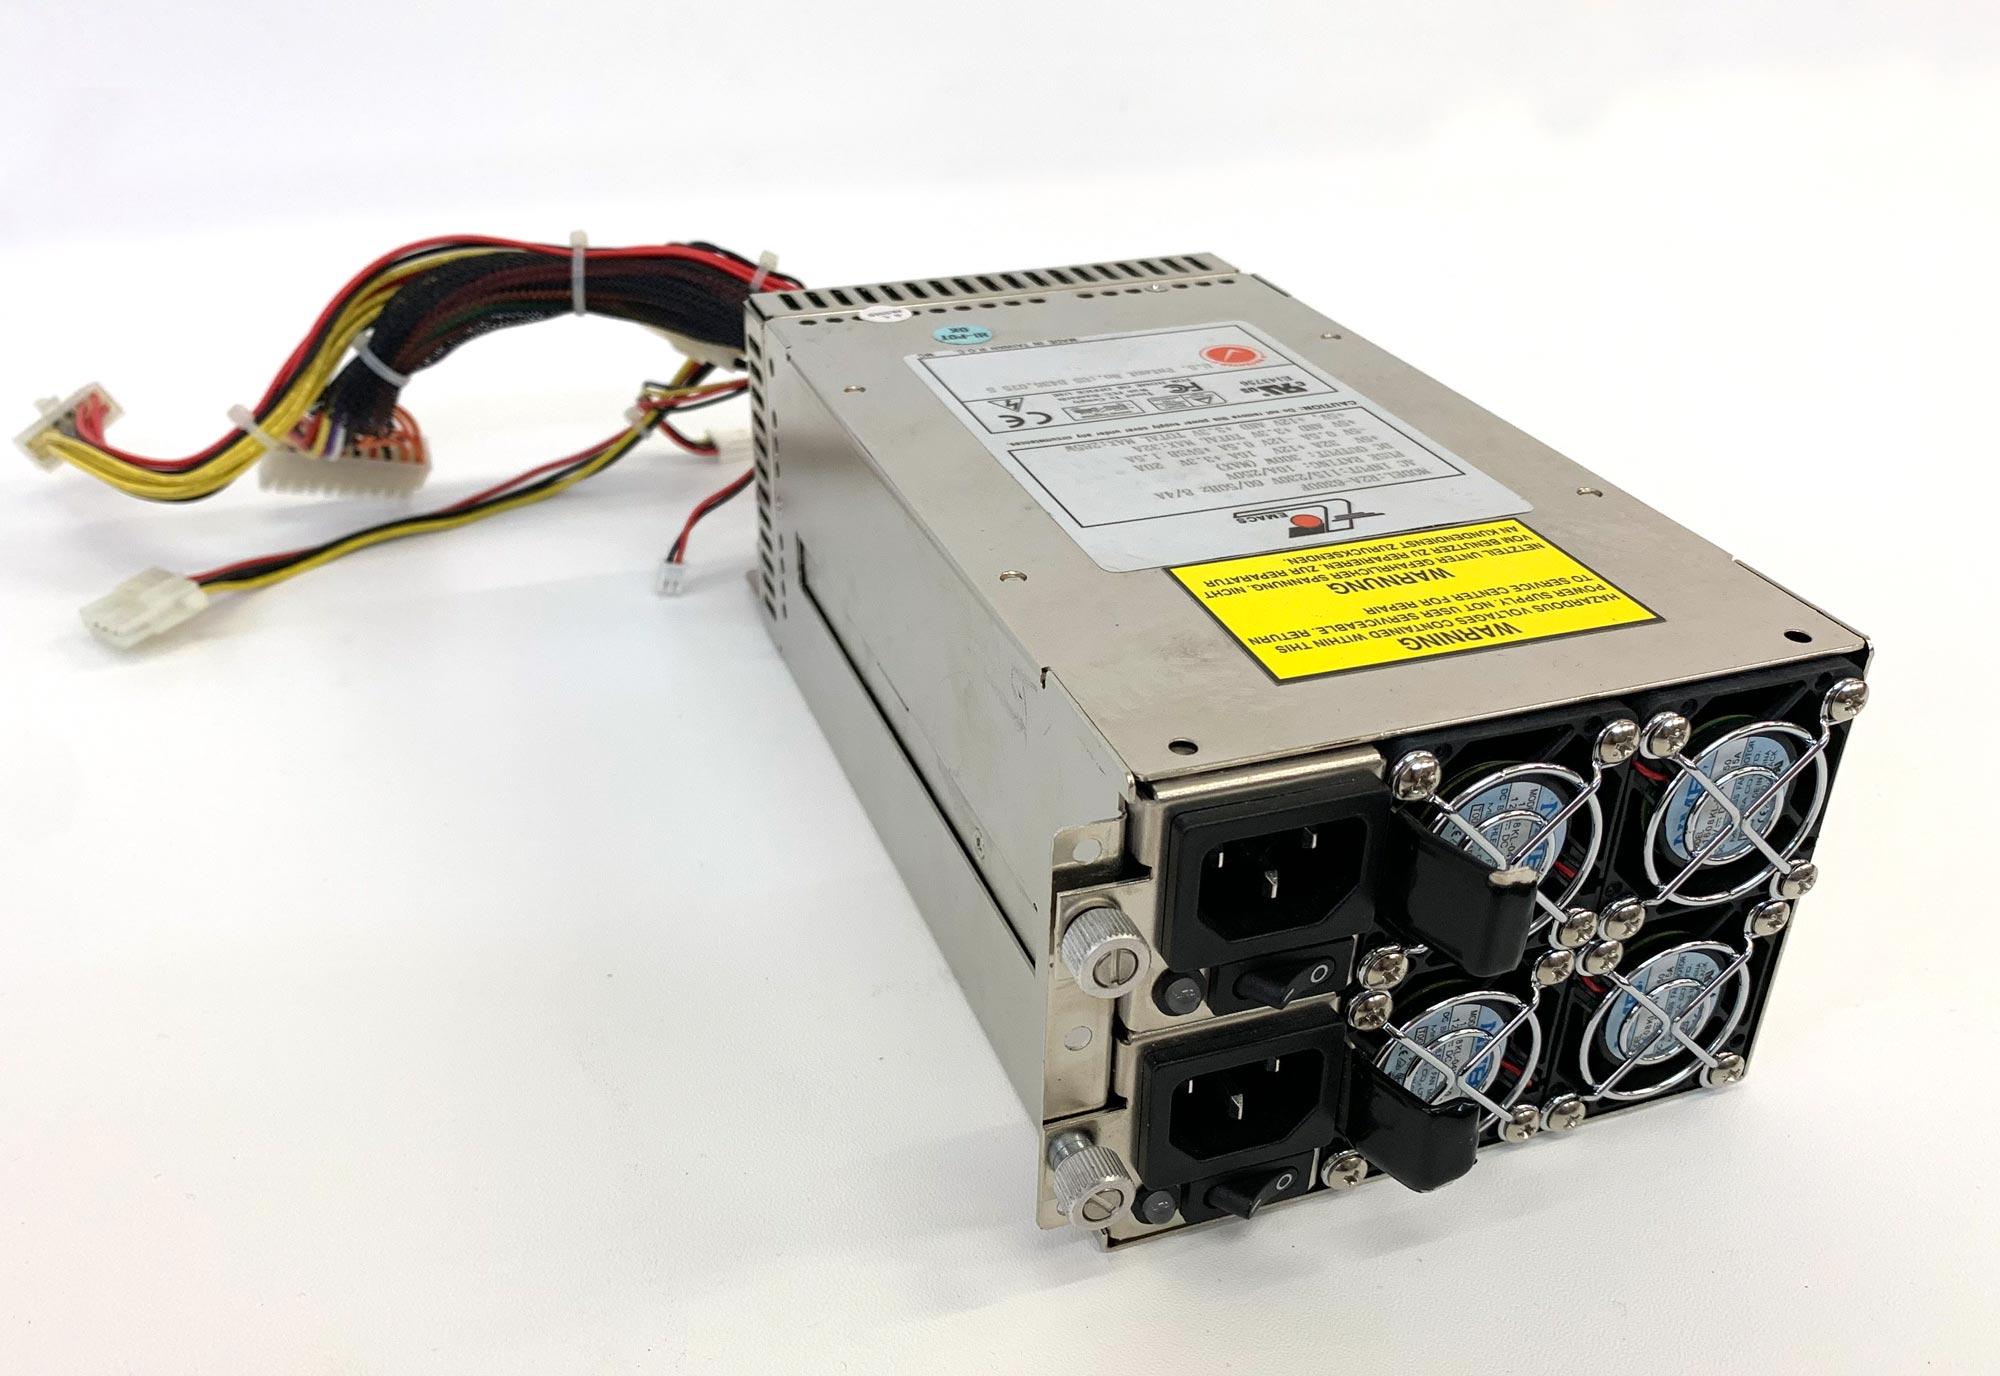 Emacs R2A-6300F - 300W IPC Netzteil, redundant